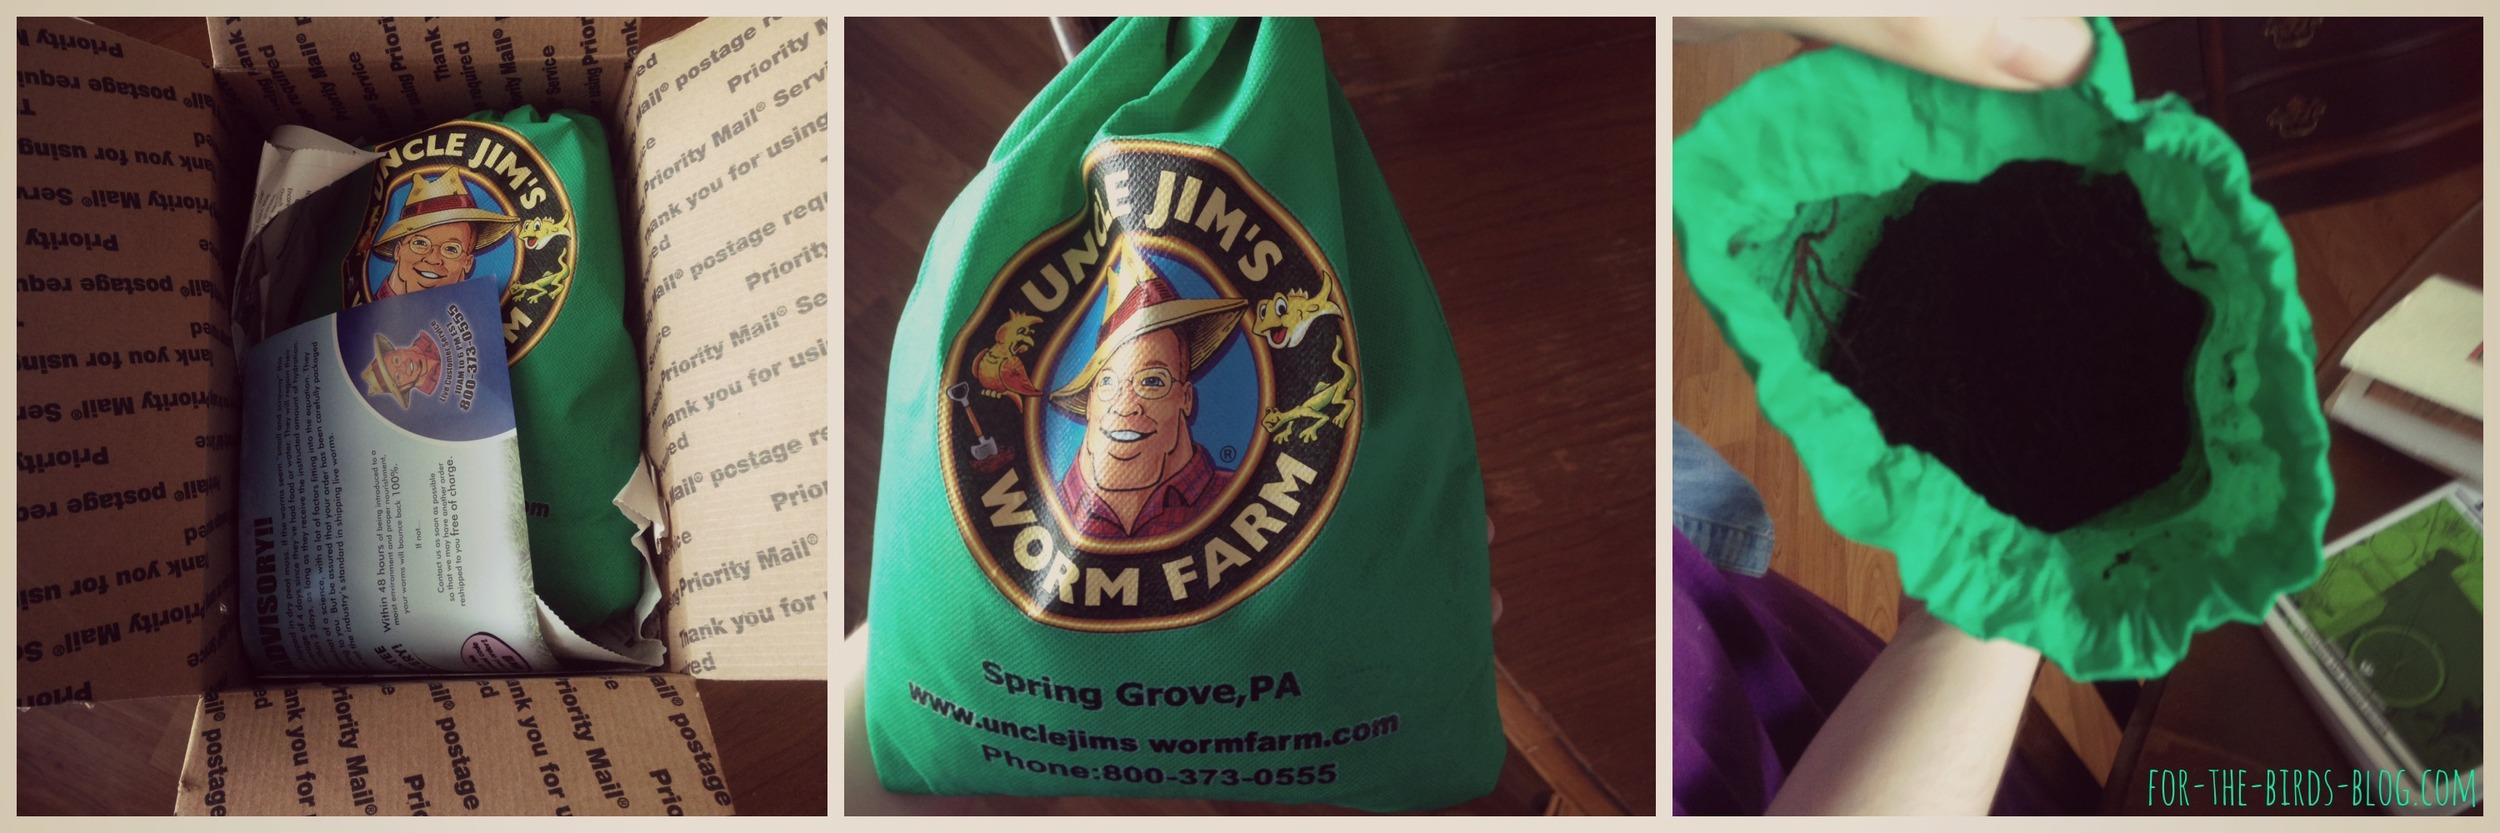 Uncle Jim's Worm Farm Delivery